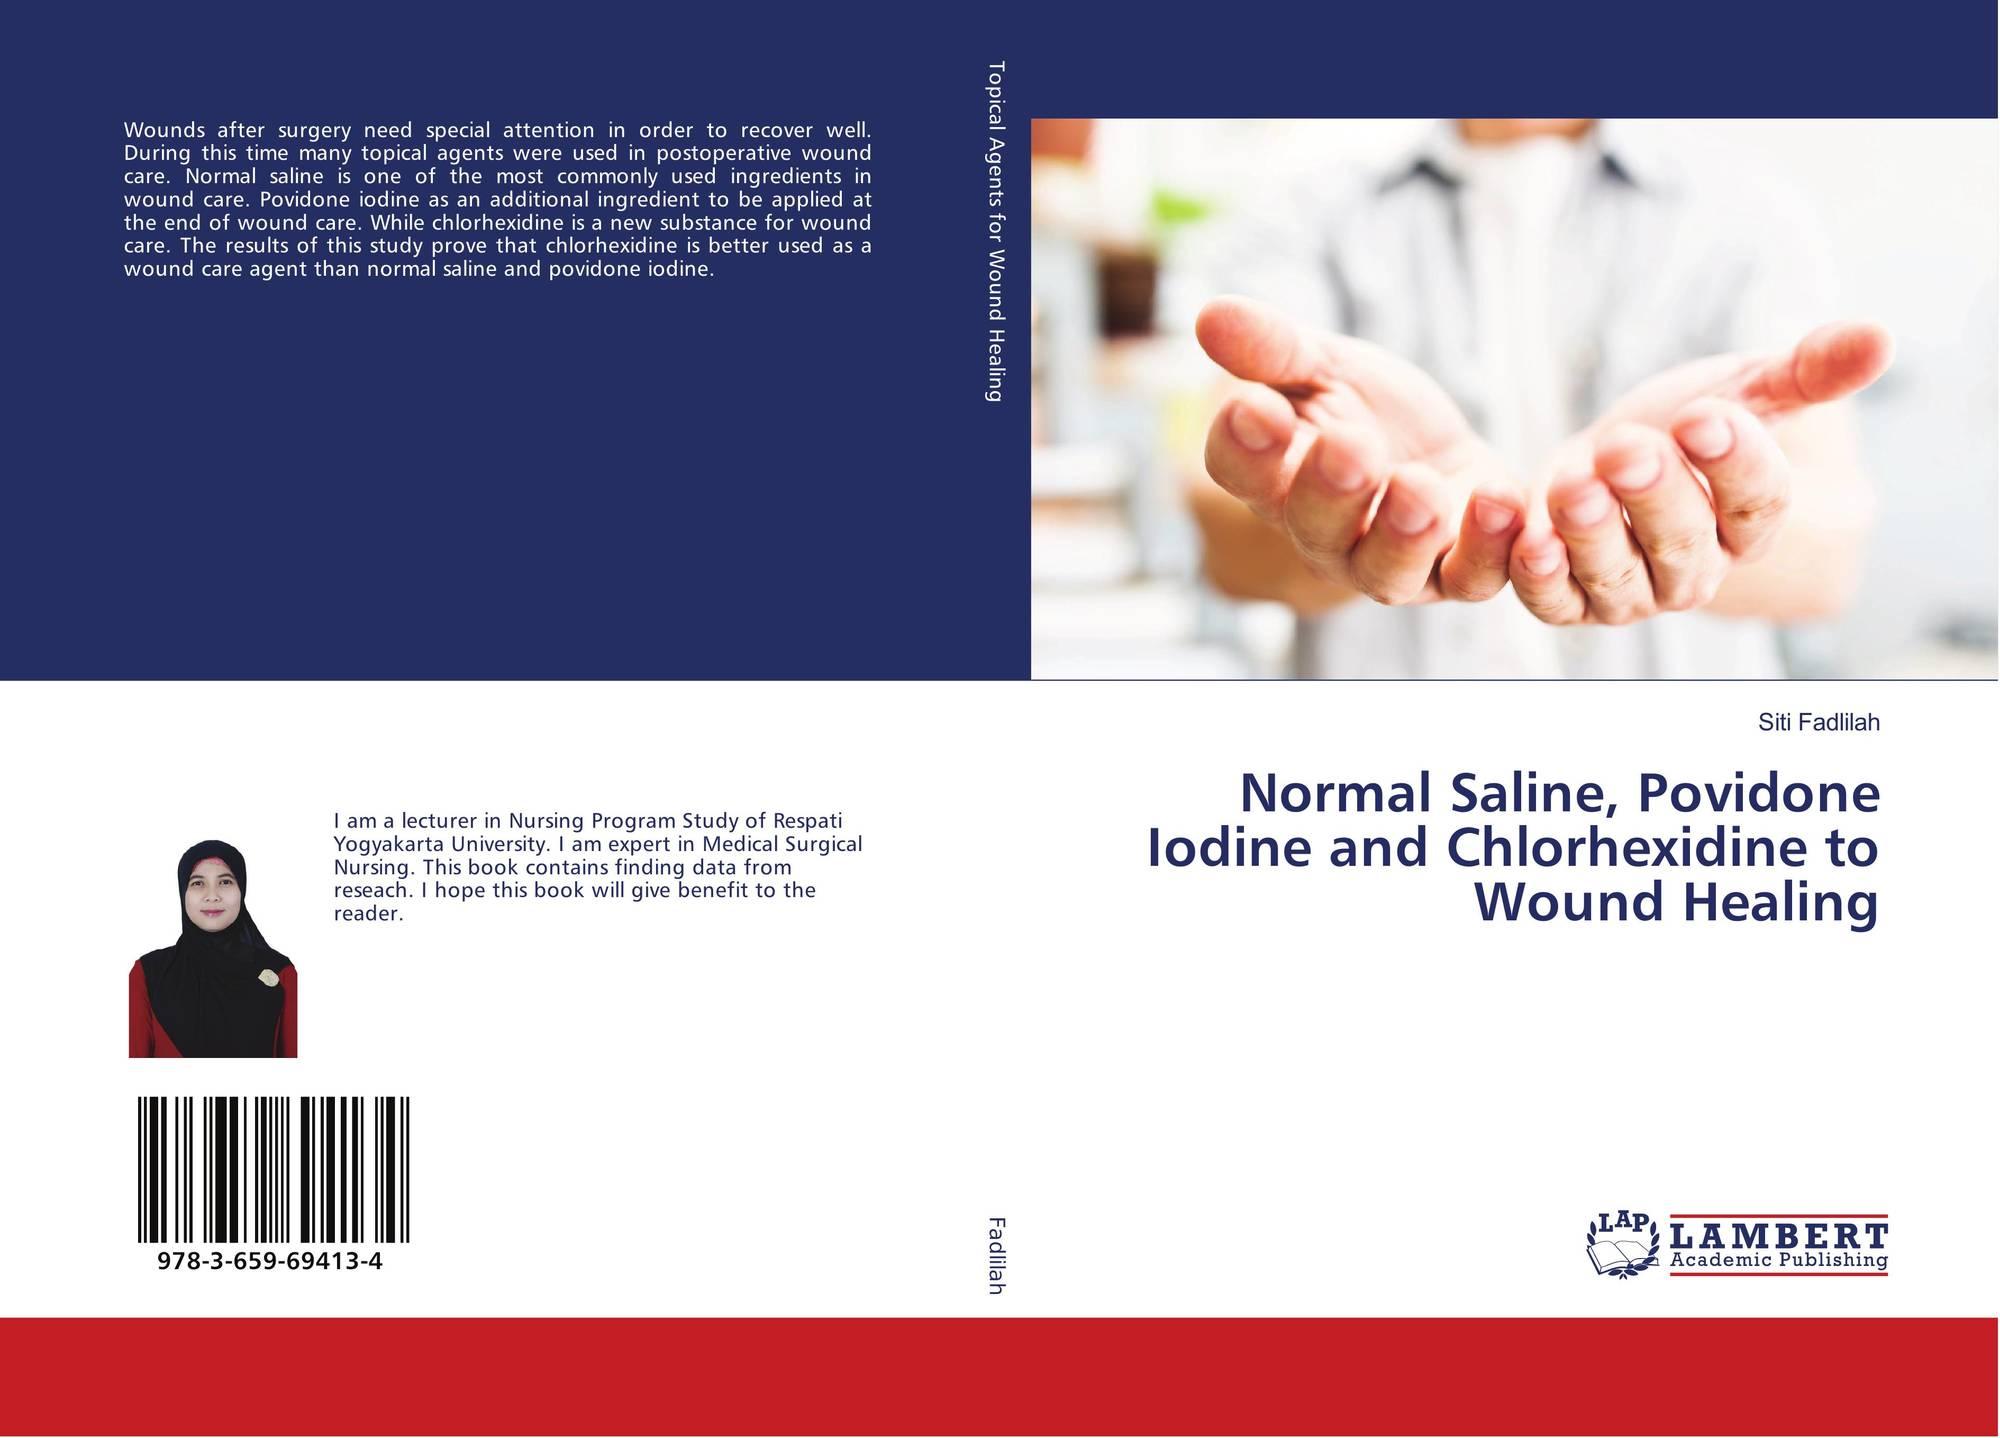 Normal Saline, Povidone Iodine and Chlorhexidine to Wound Healing